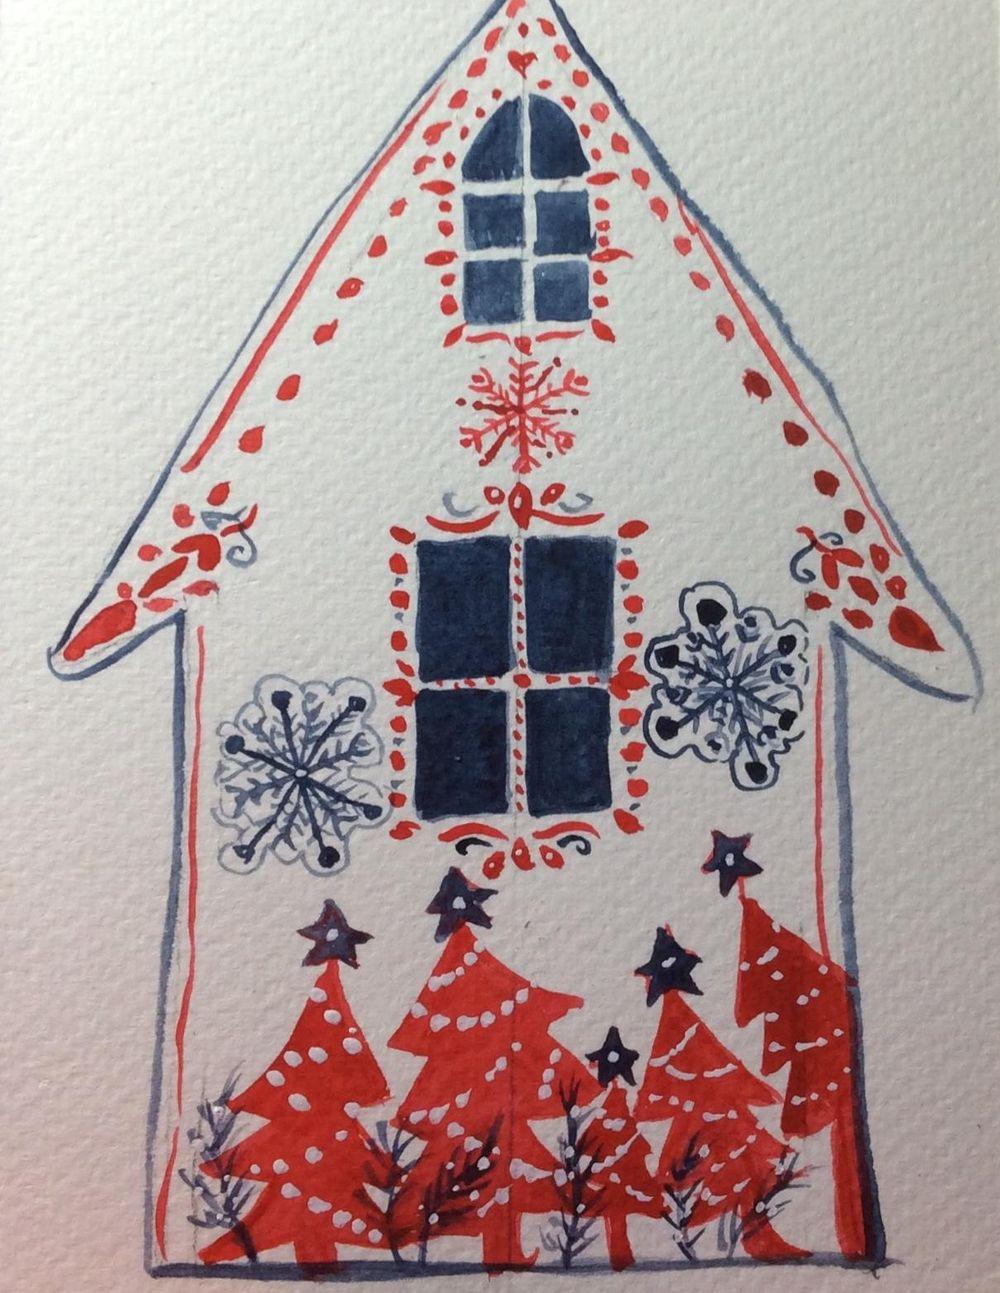 christmas joy! - image 4 - student project